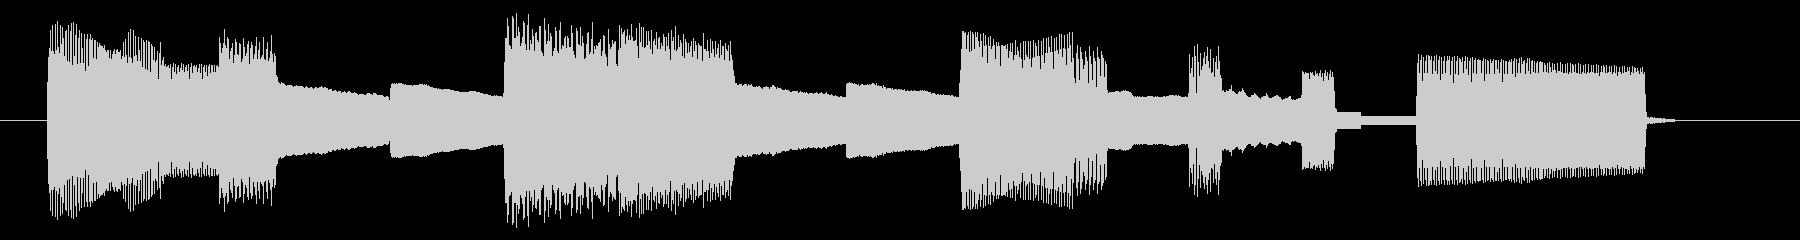 NES RPG A12-1(宿)の未再生の波形